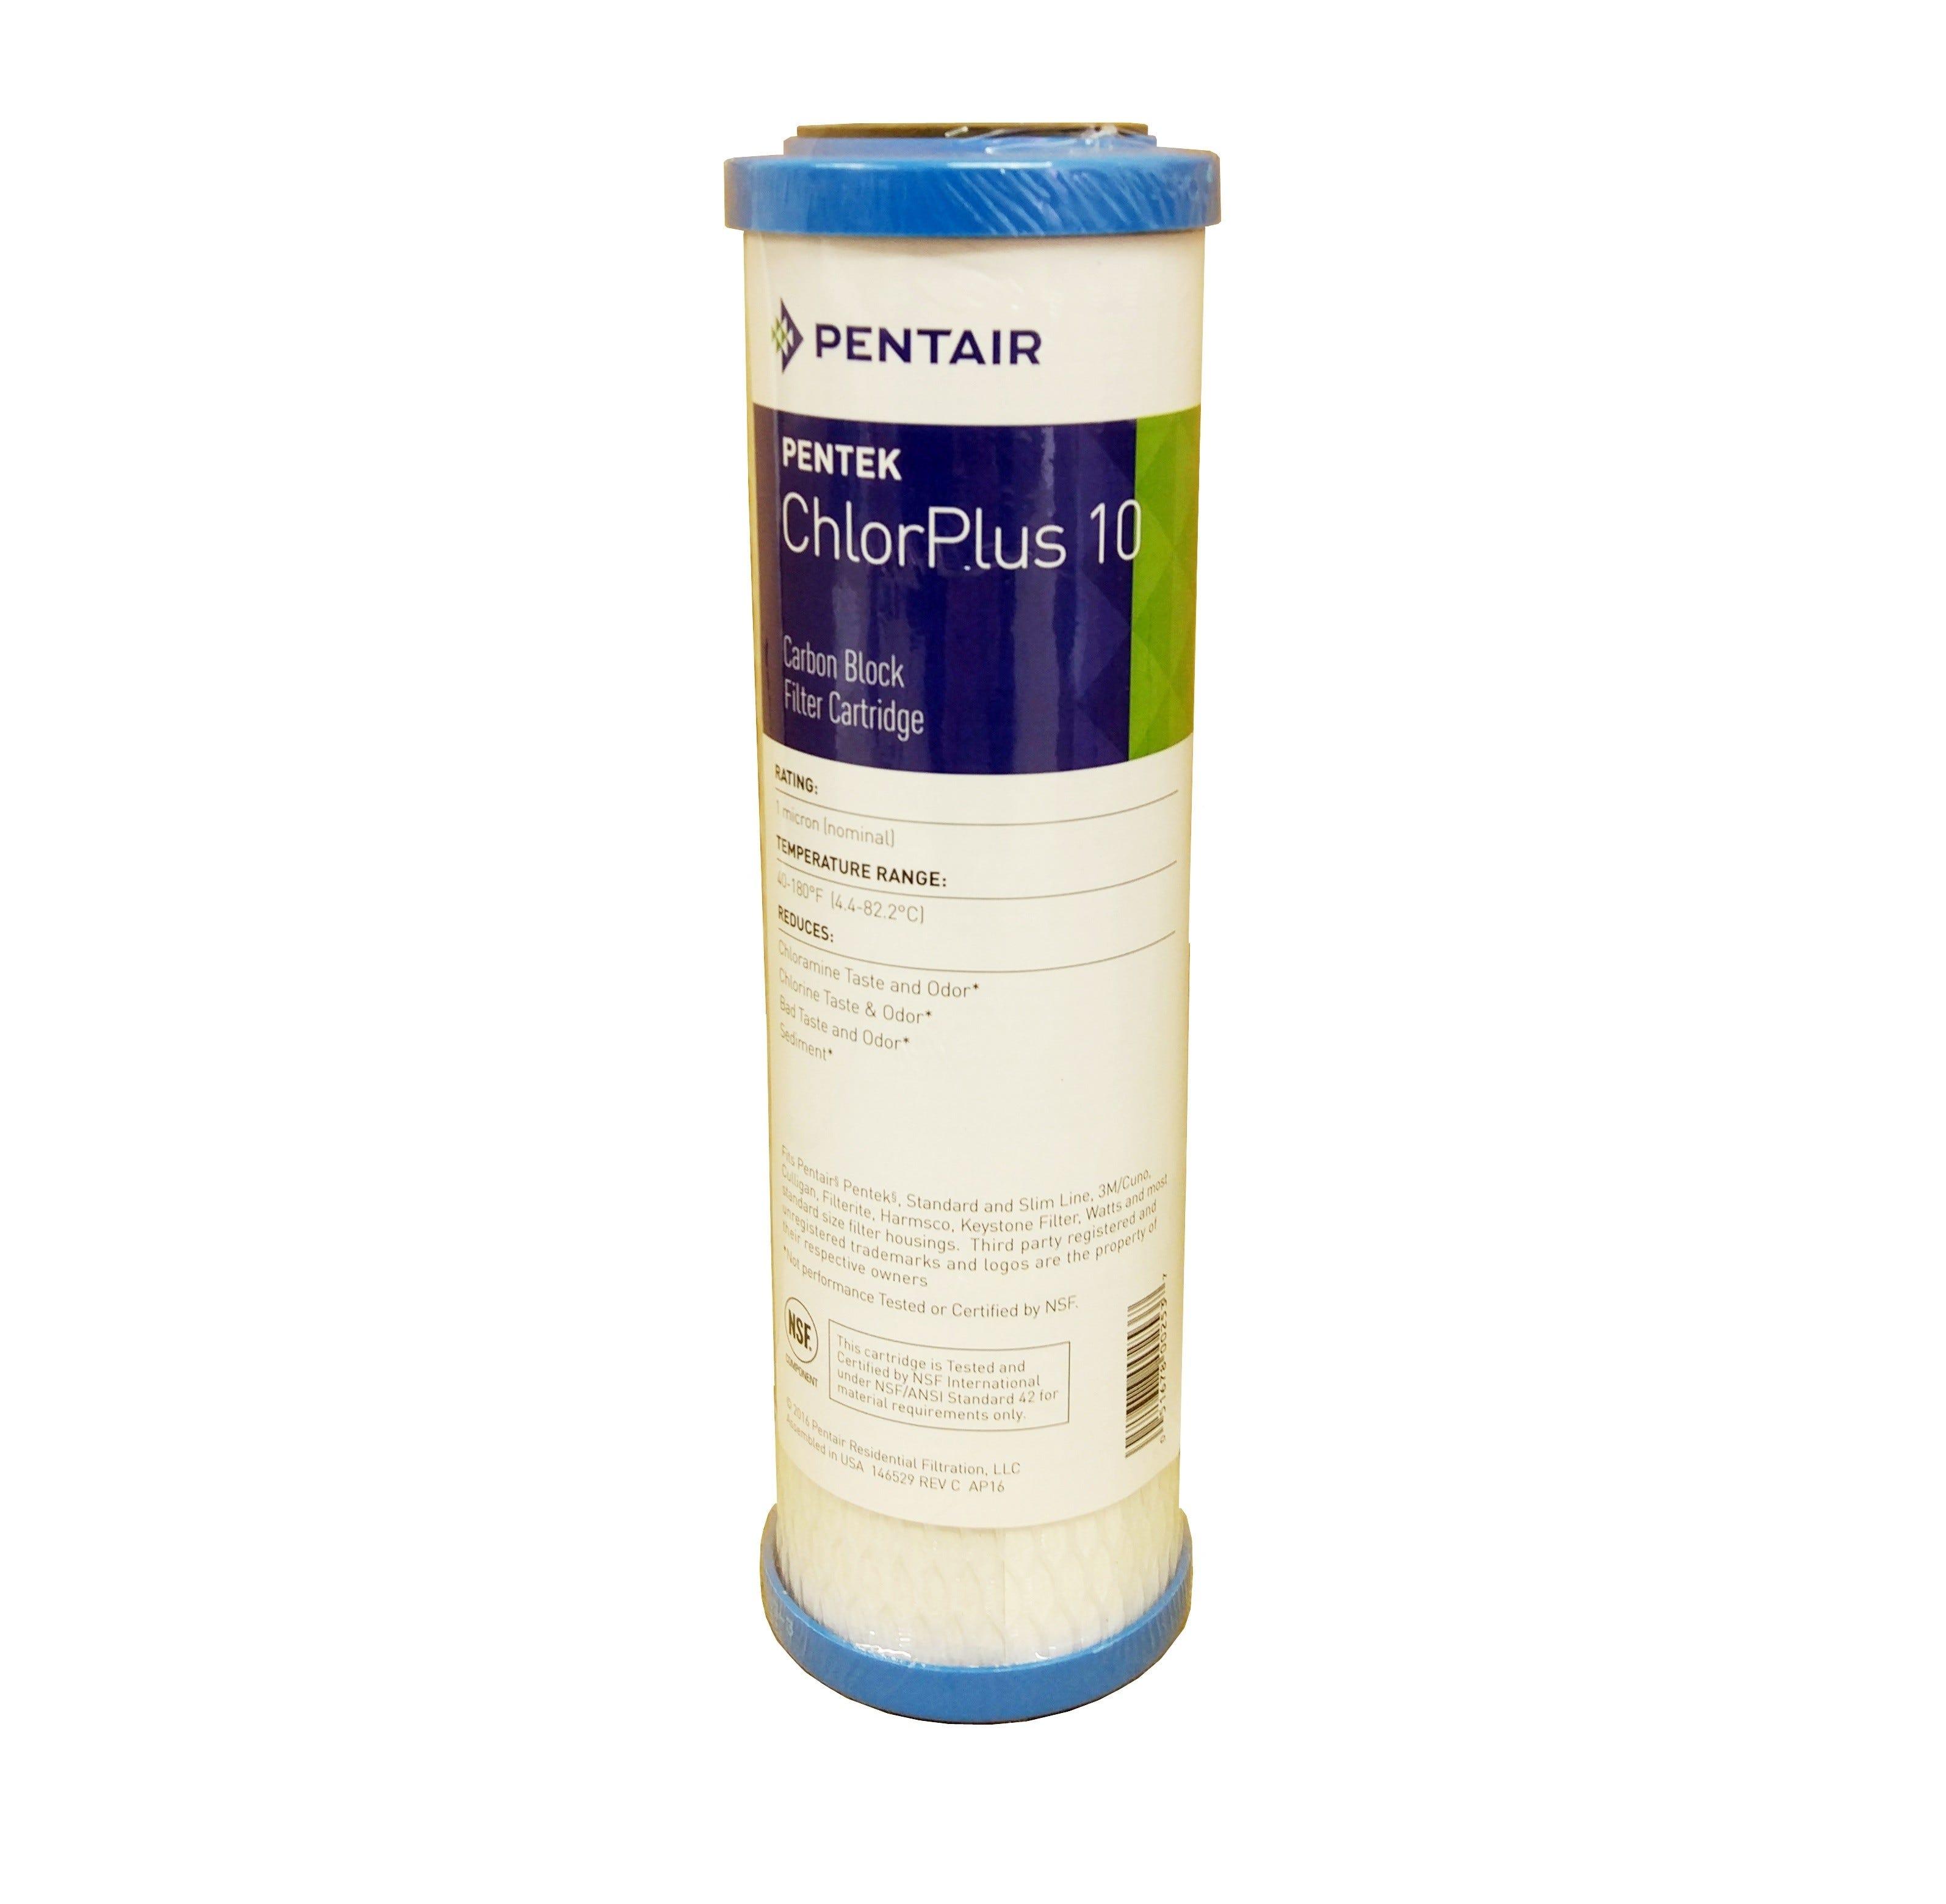 "Pentek CHLORPLUS 10"" 1 Micron Carbon Block Filter"